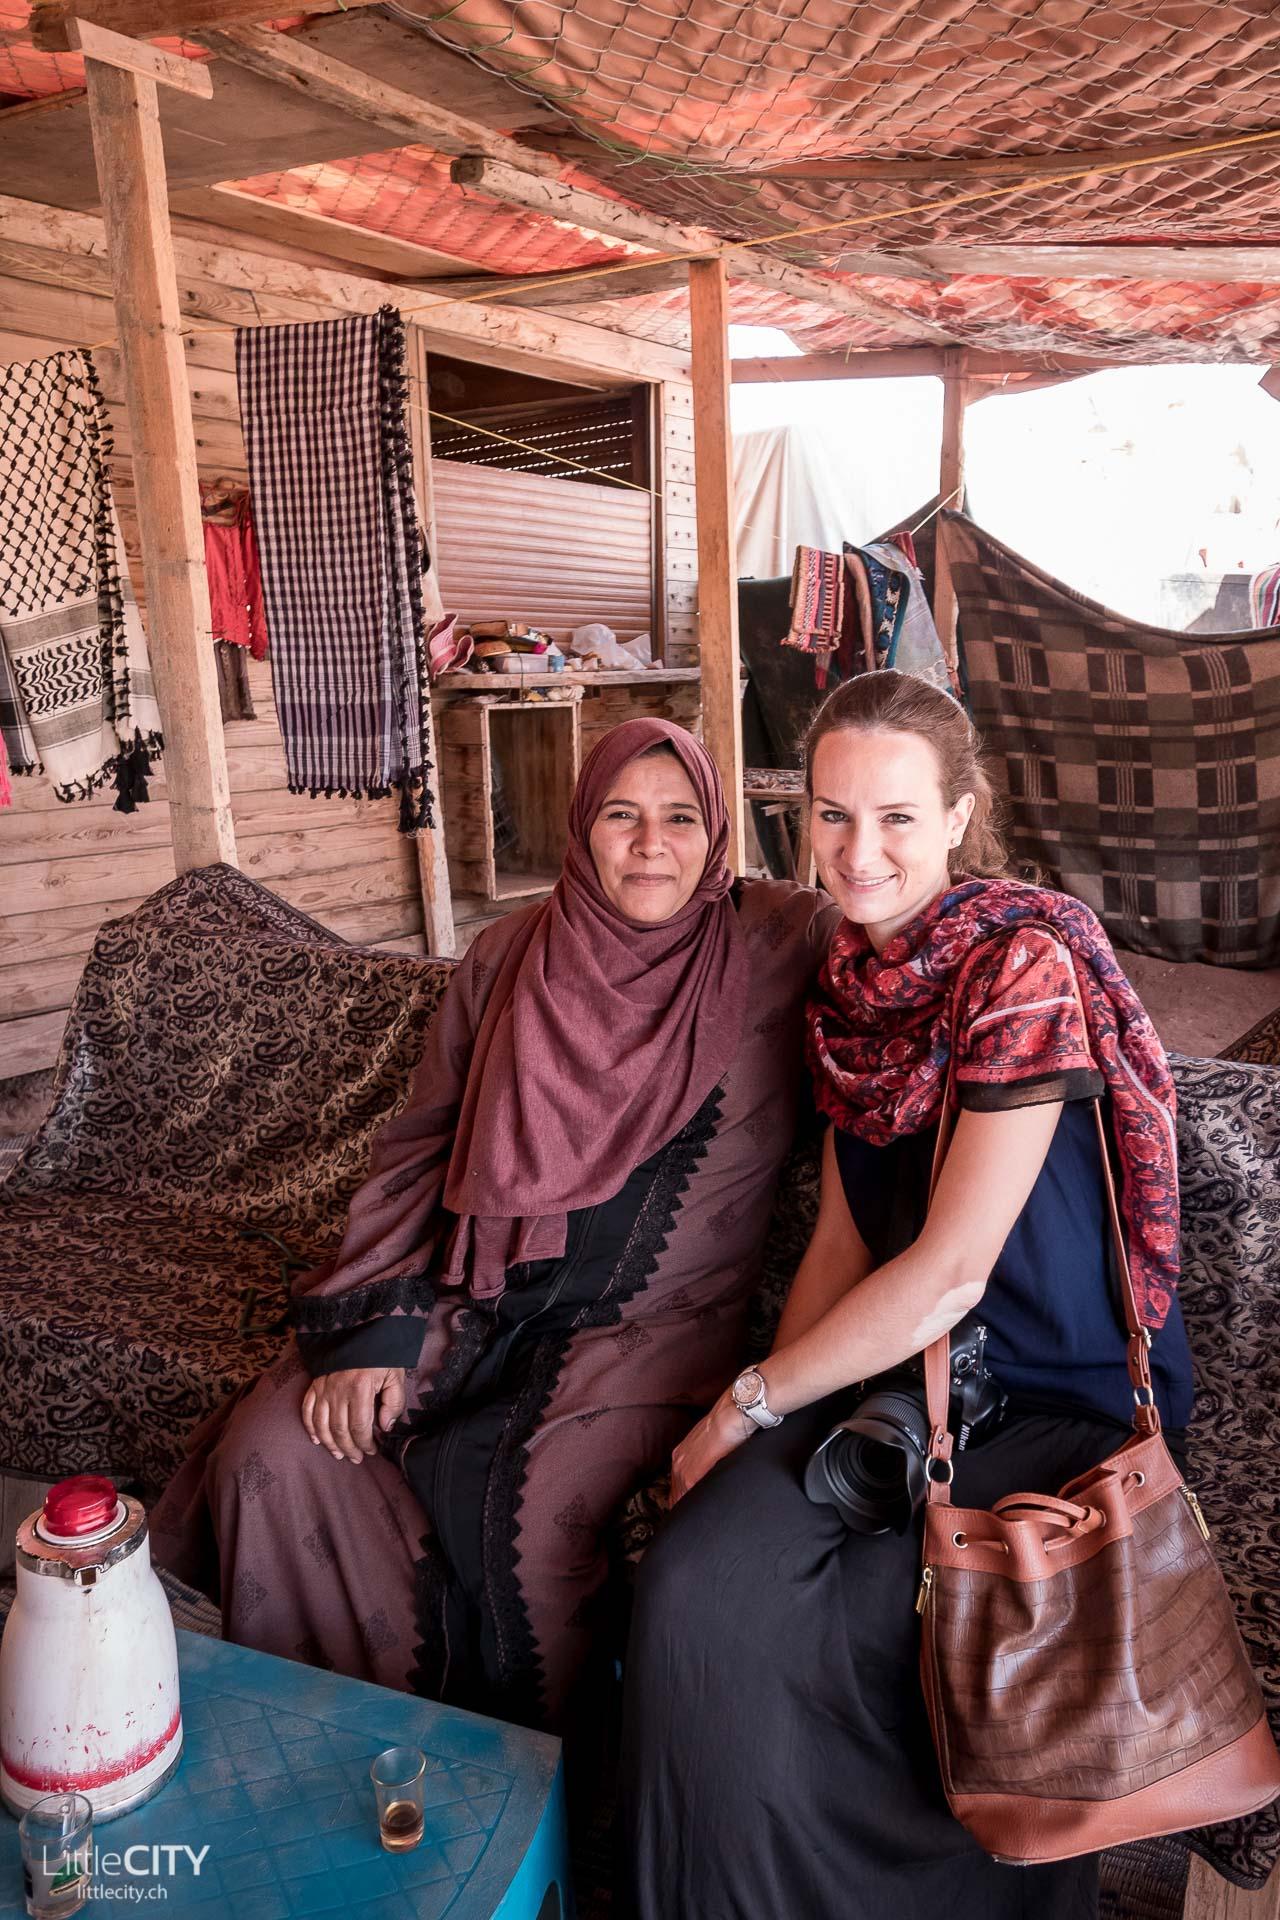 Petra Jordanien Reisetipp & Fakten